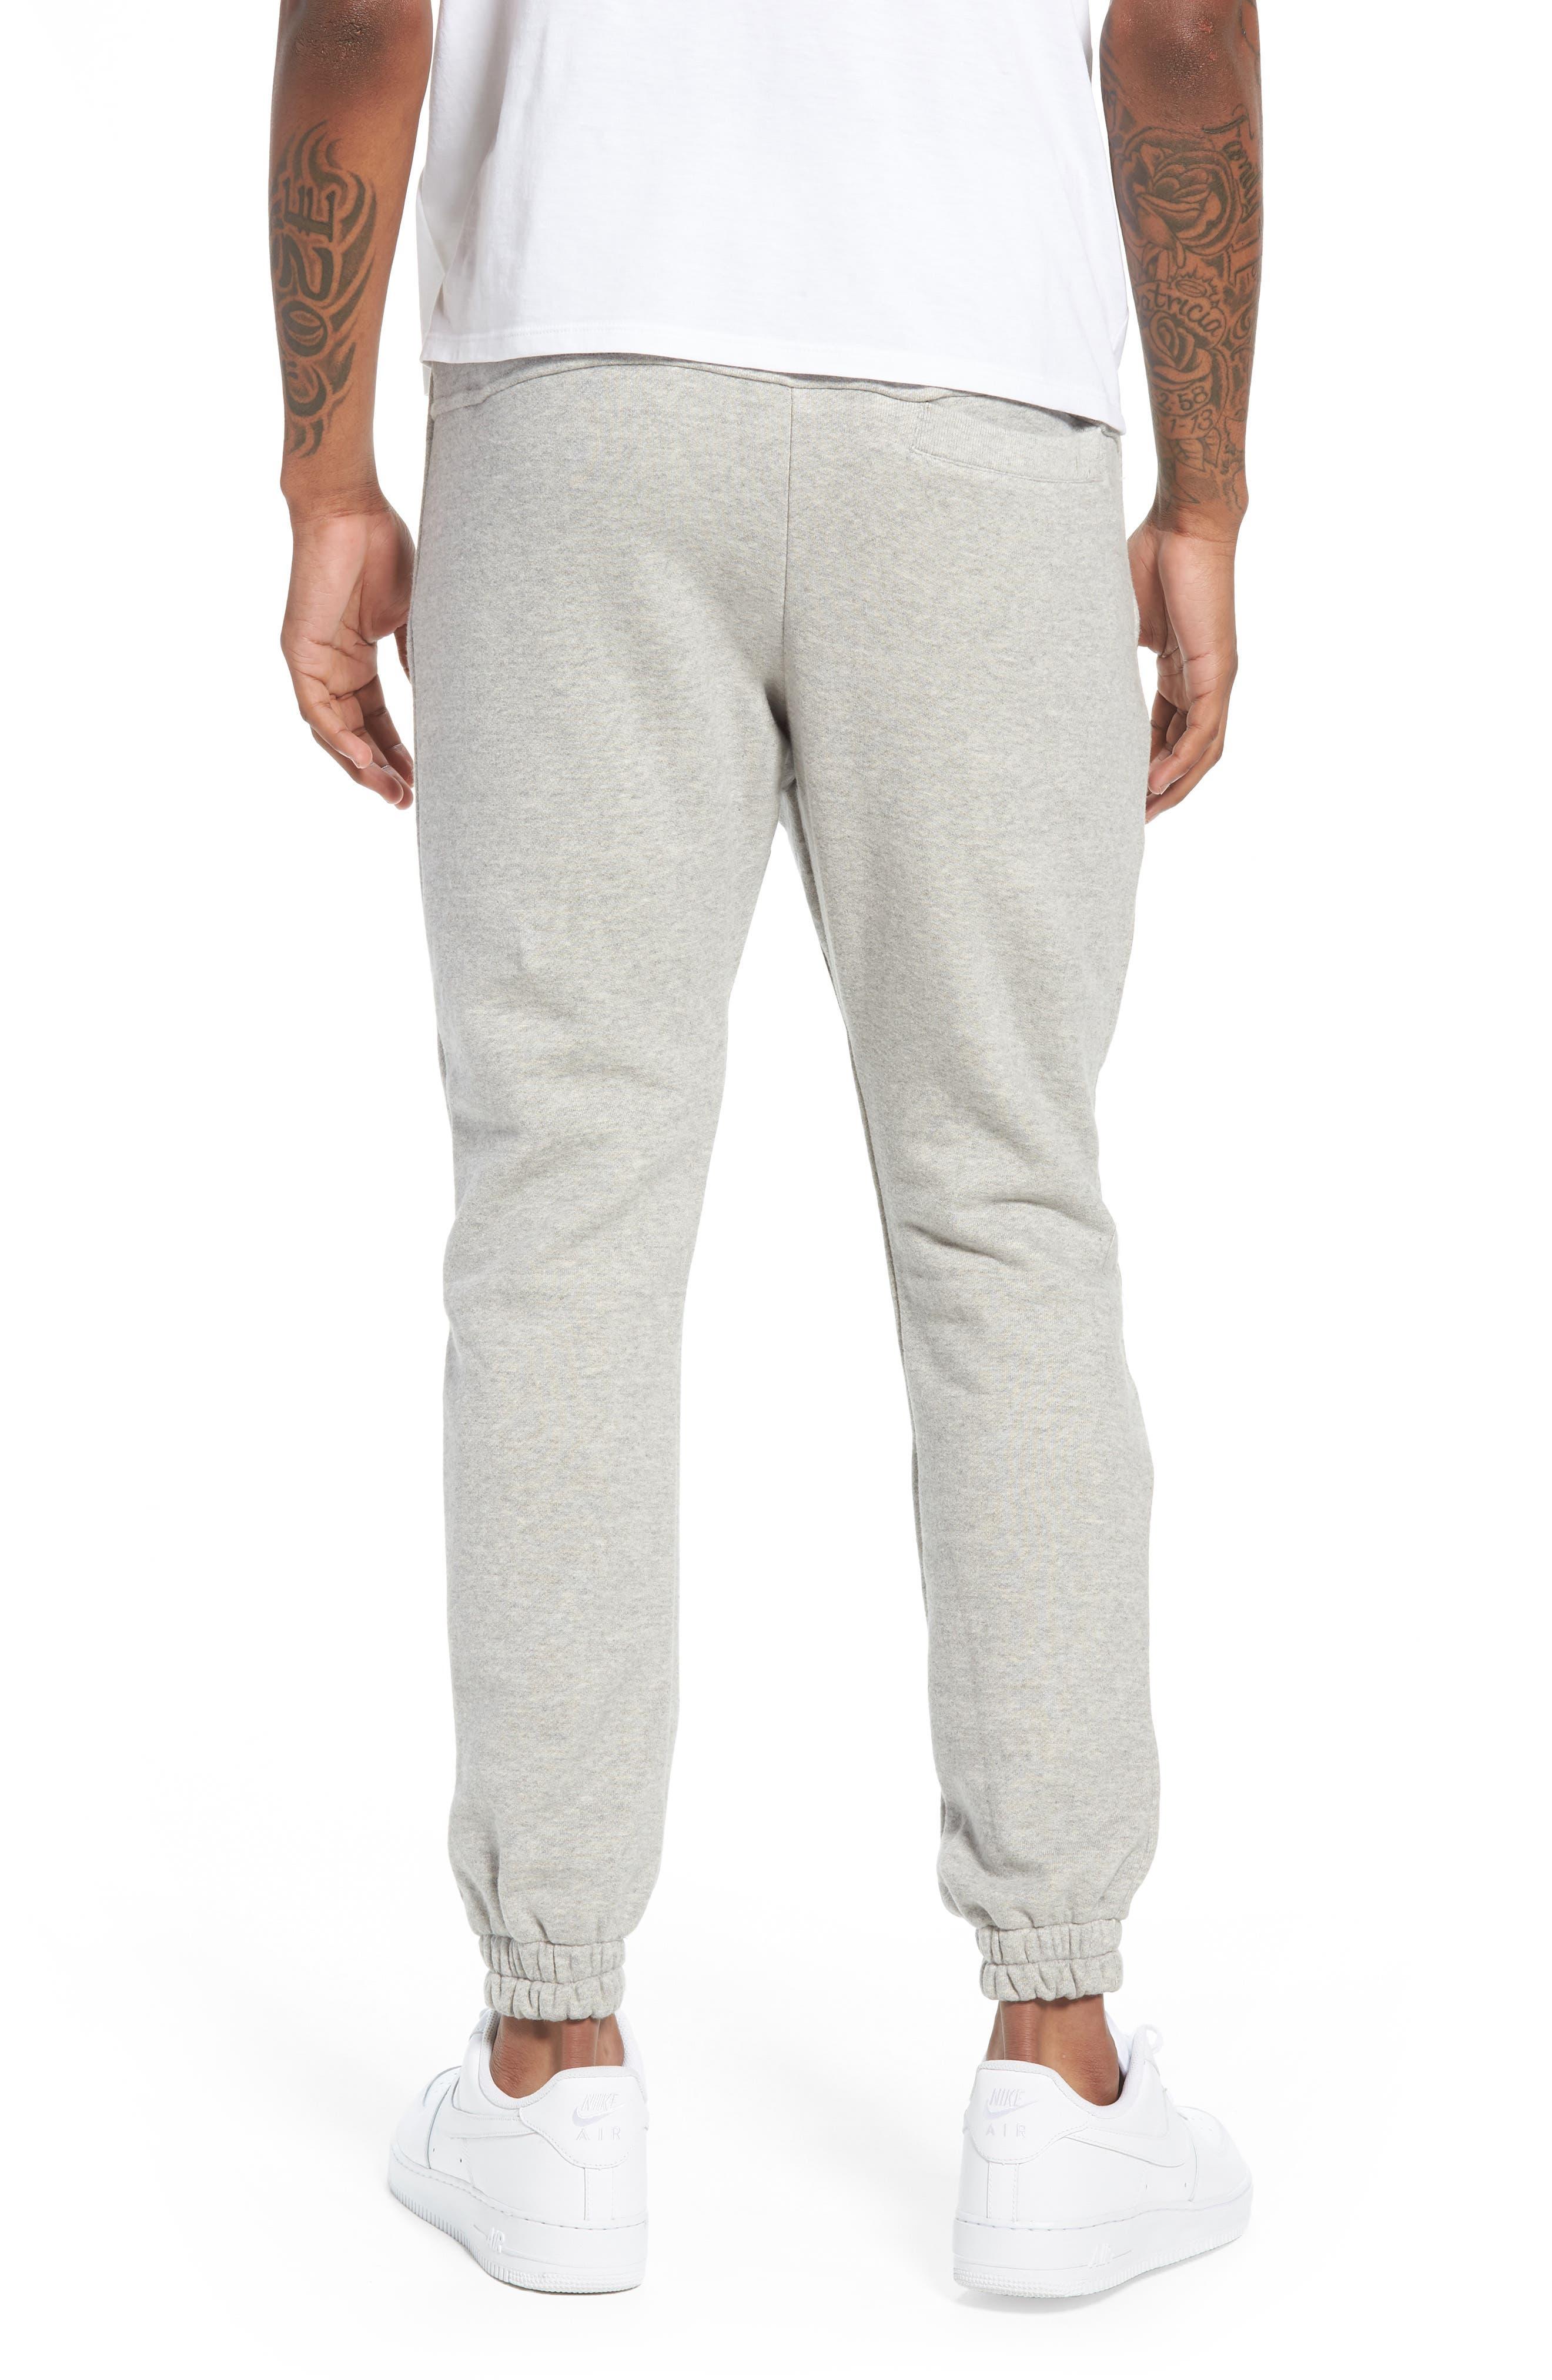 Plaid Jogger Pants,                             Alternate thumbnail 2, color,                             Grey